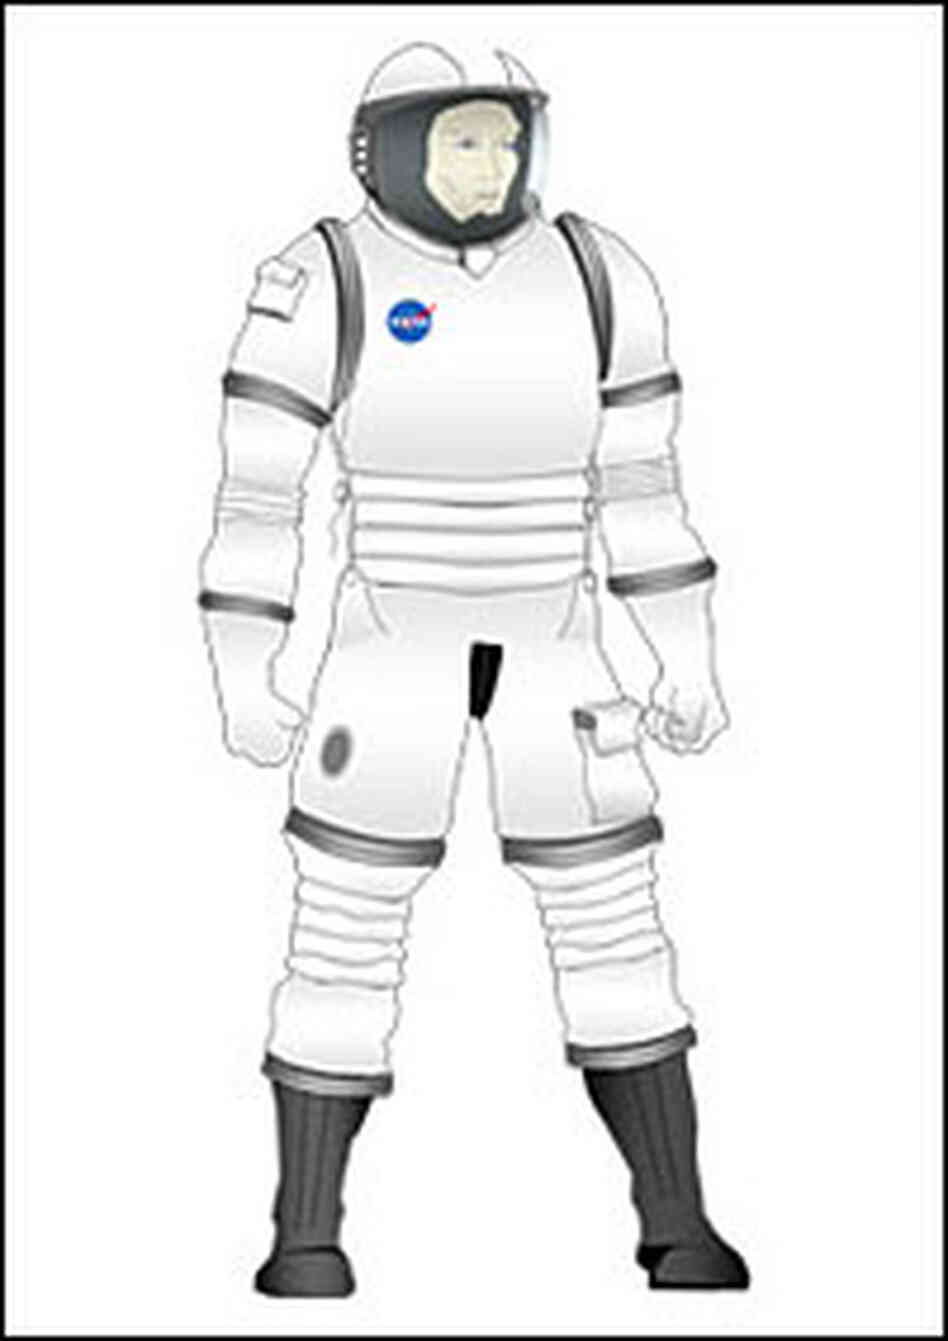 future space suits designs - photo #35